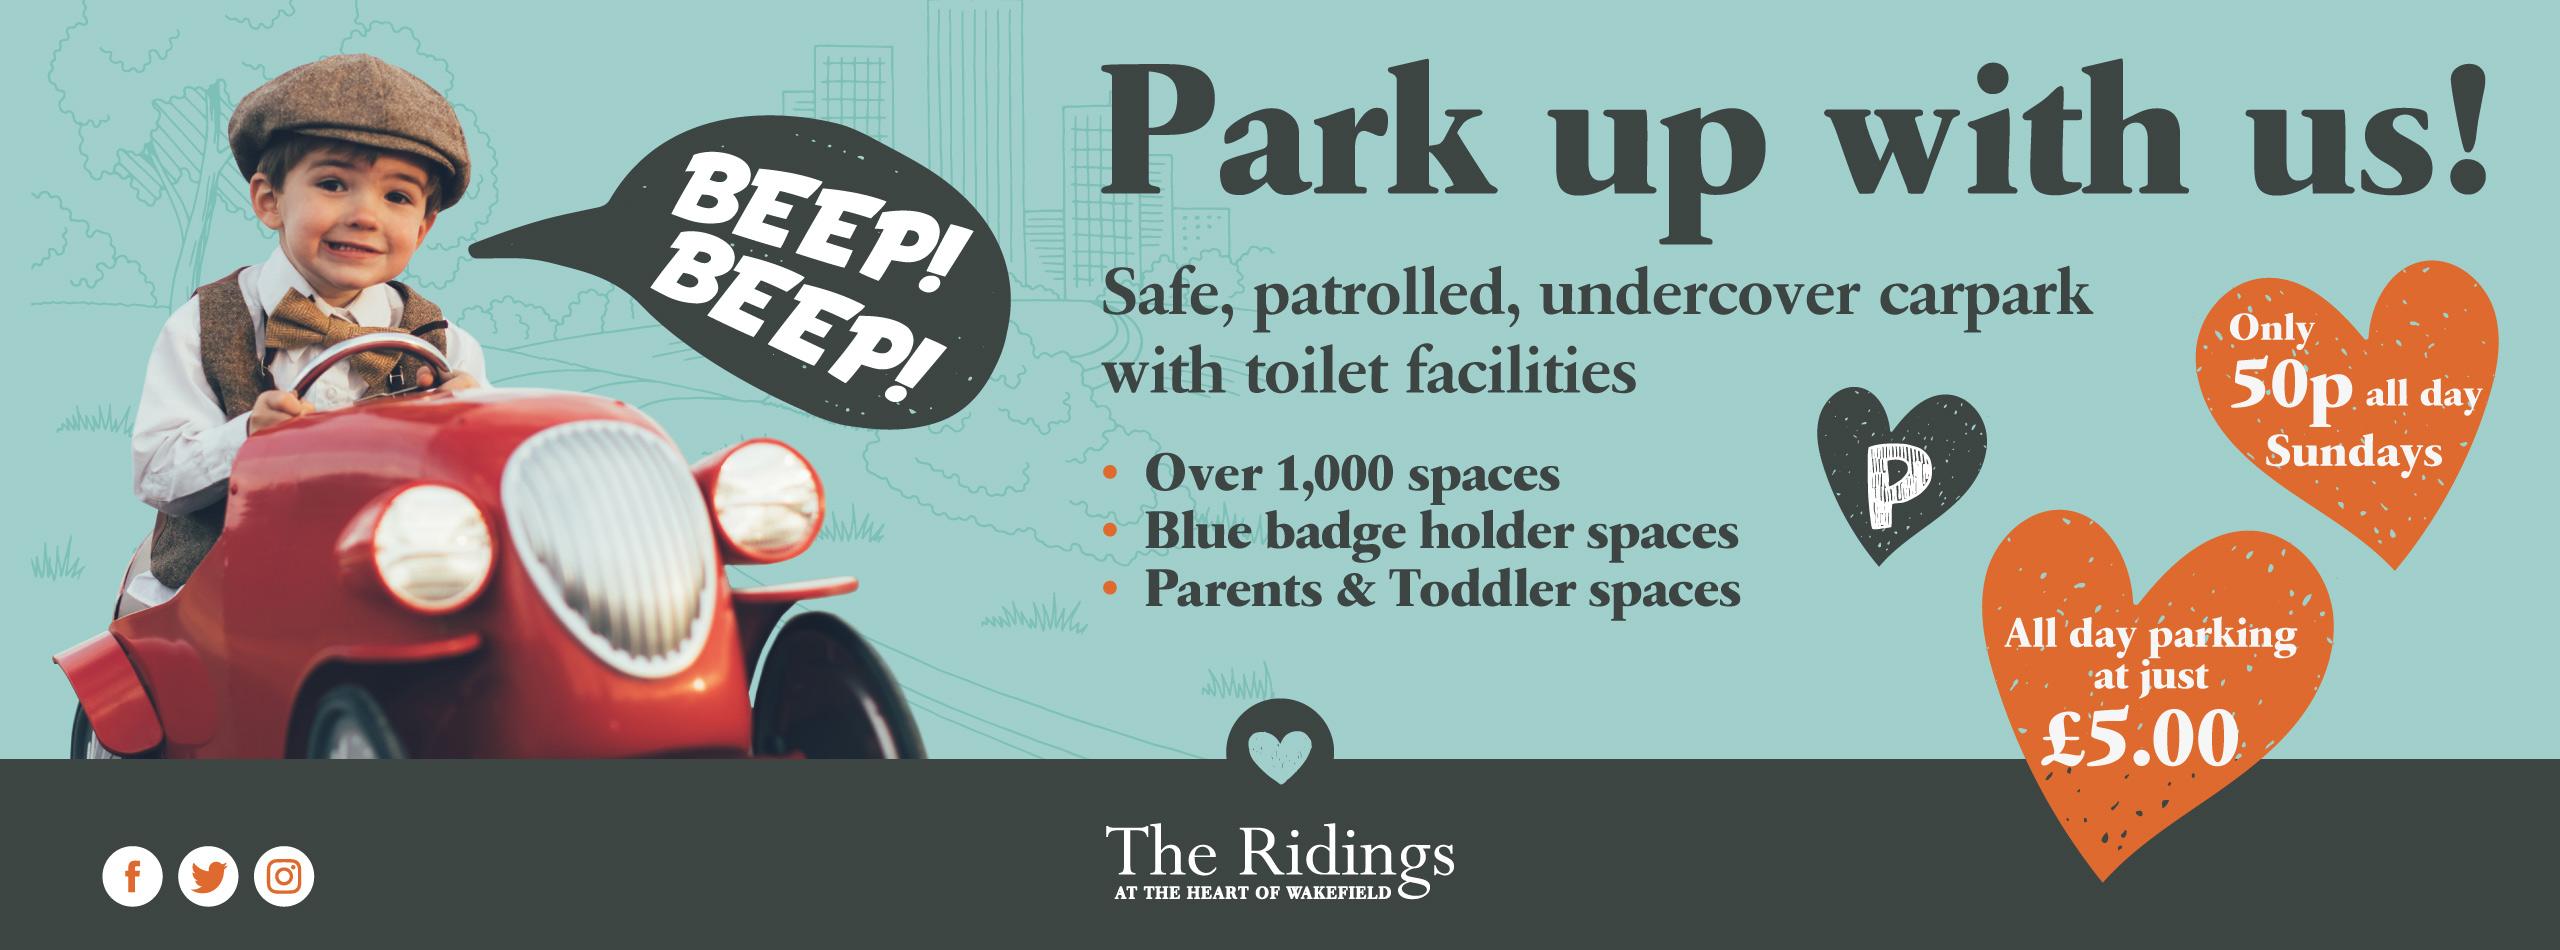 THE-RIDINGS-CAR-PARK-CAMPAIGN_Web-Banner